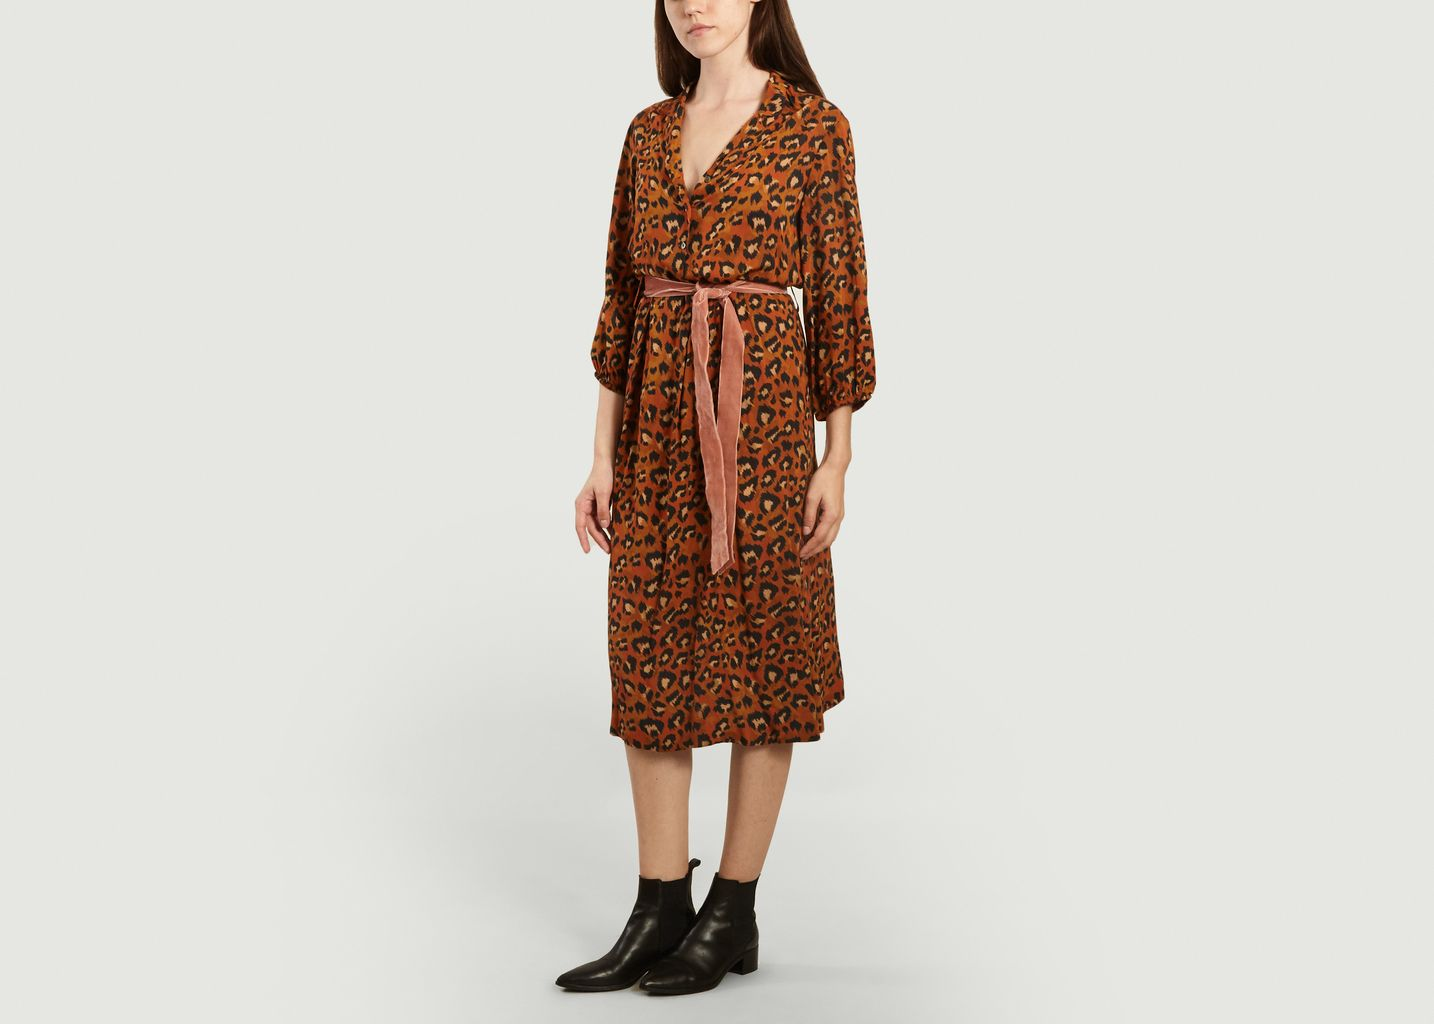 Robe imprimé léopard Armory - Bellerose